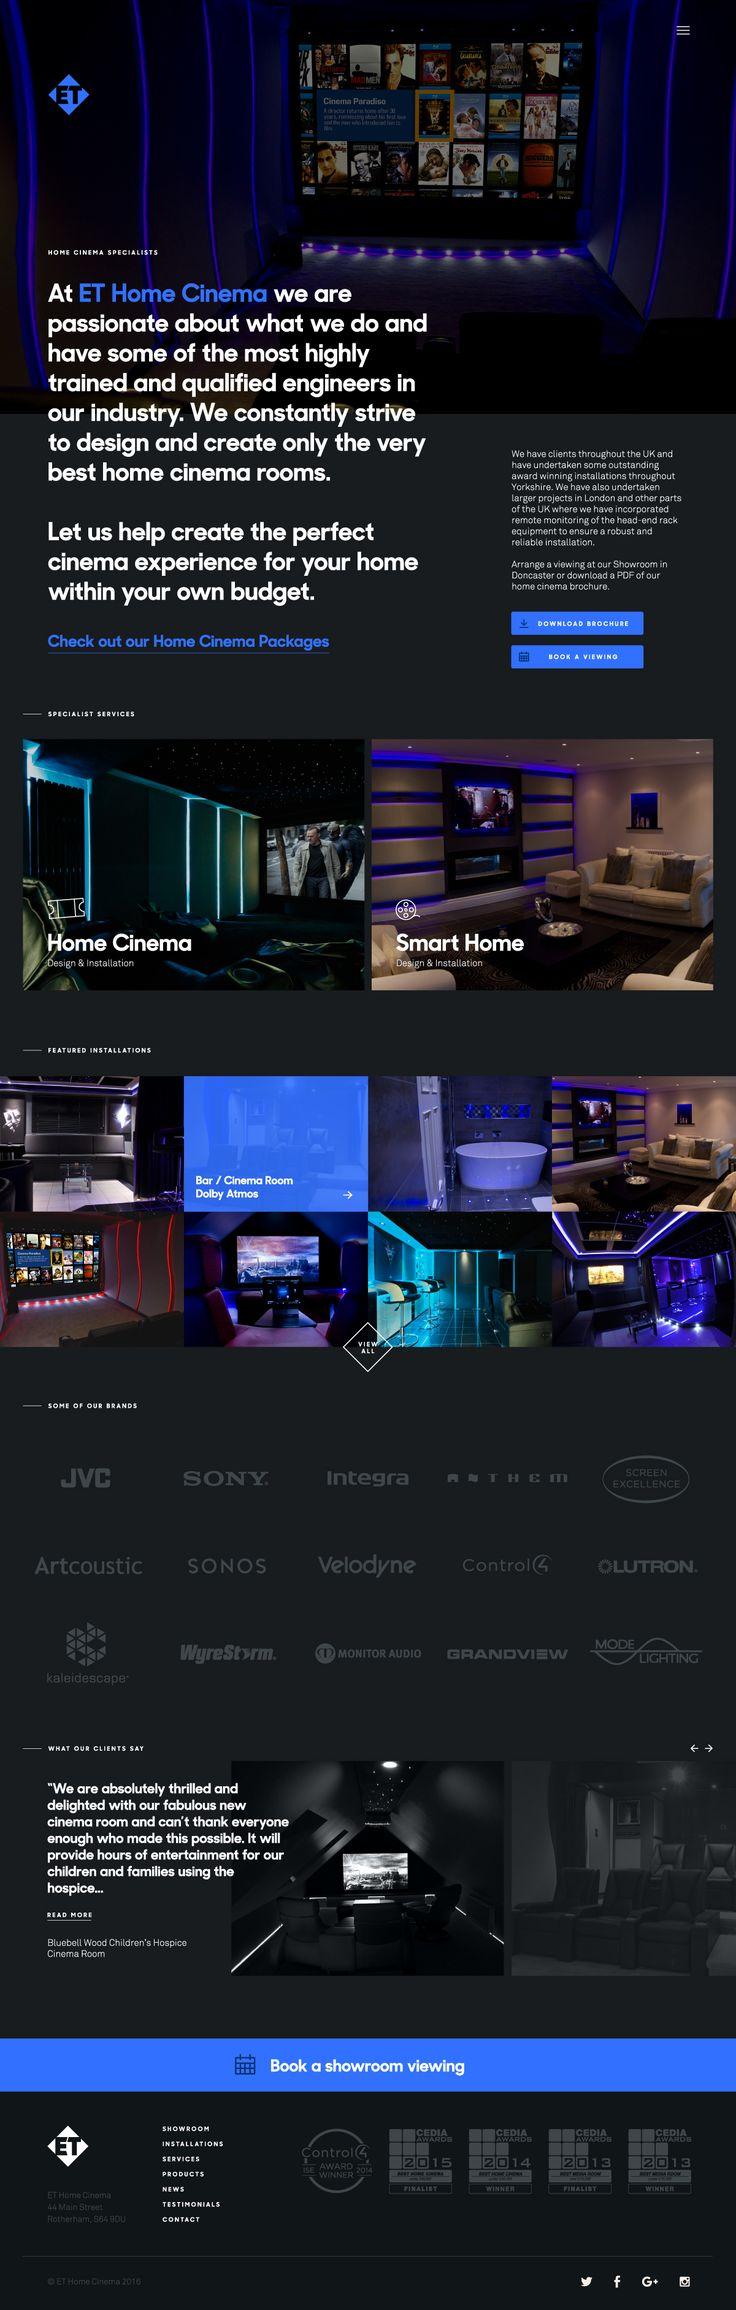 best 25 jordan cinema ideas on pinterest wes anderson book siteoftheday webdesign website et home cinema webdesign award website of the day by jordan gilroy design designer uk great britain england london